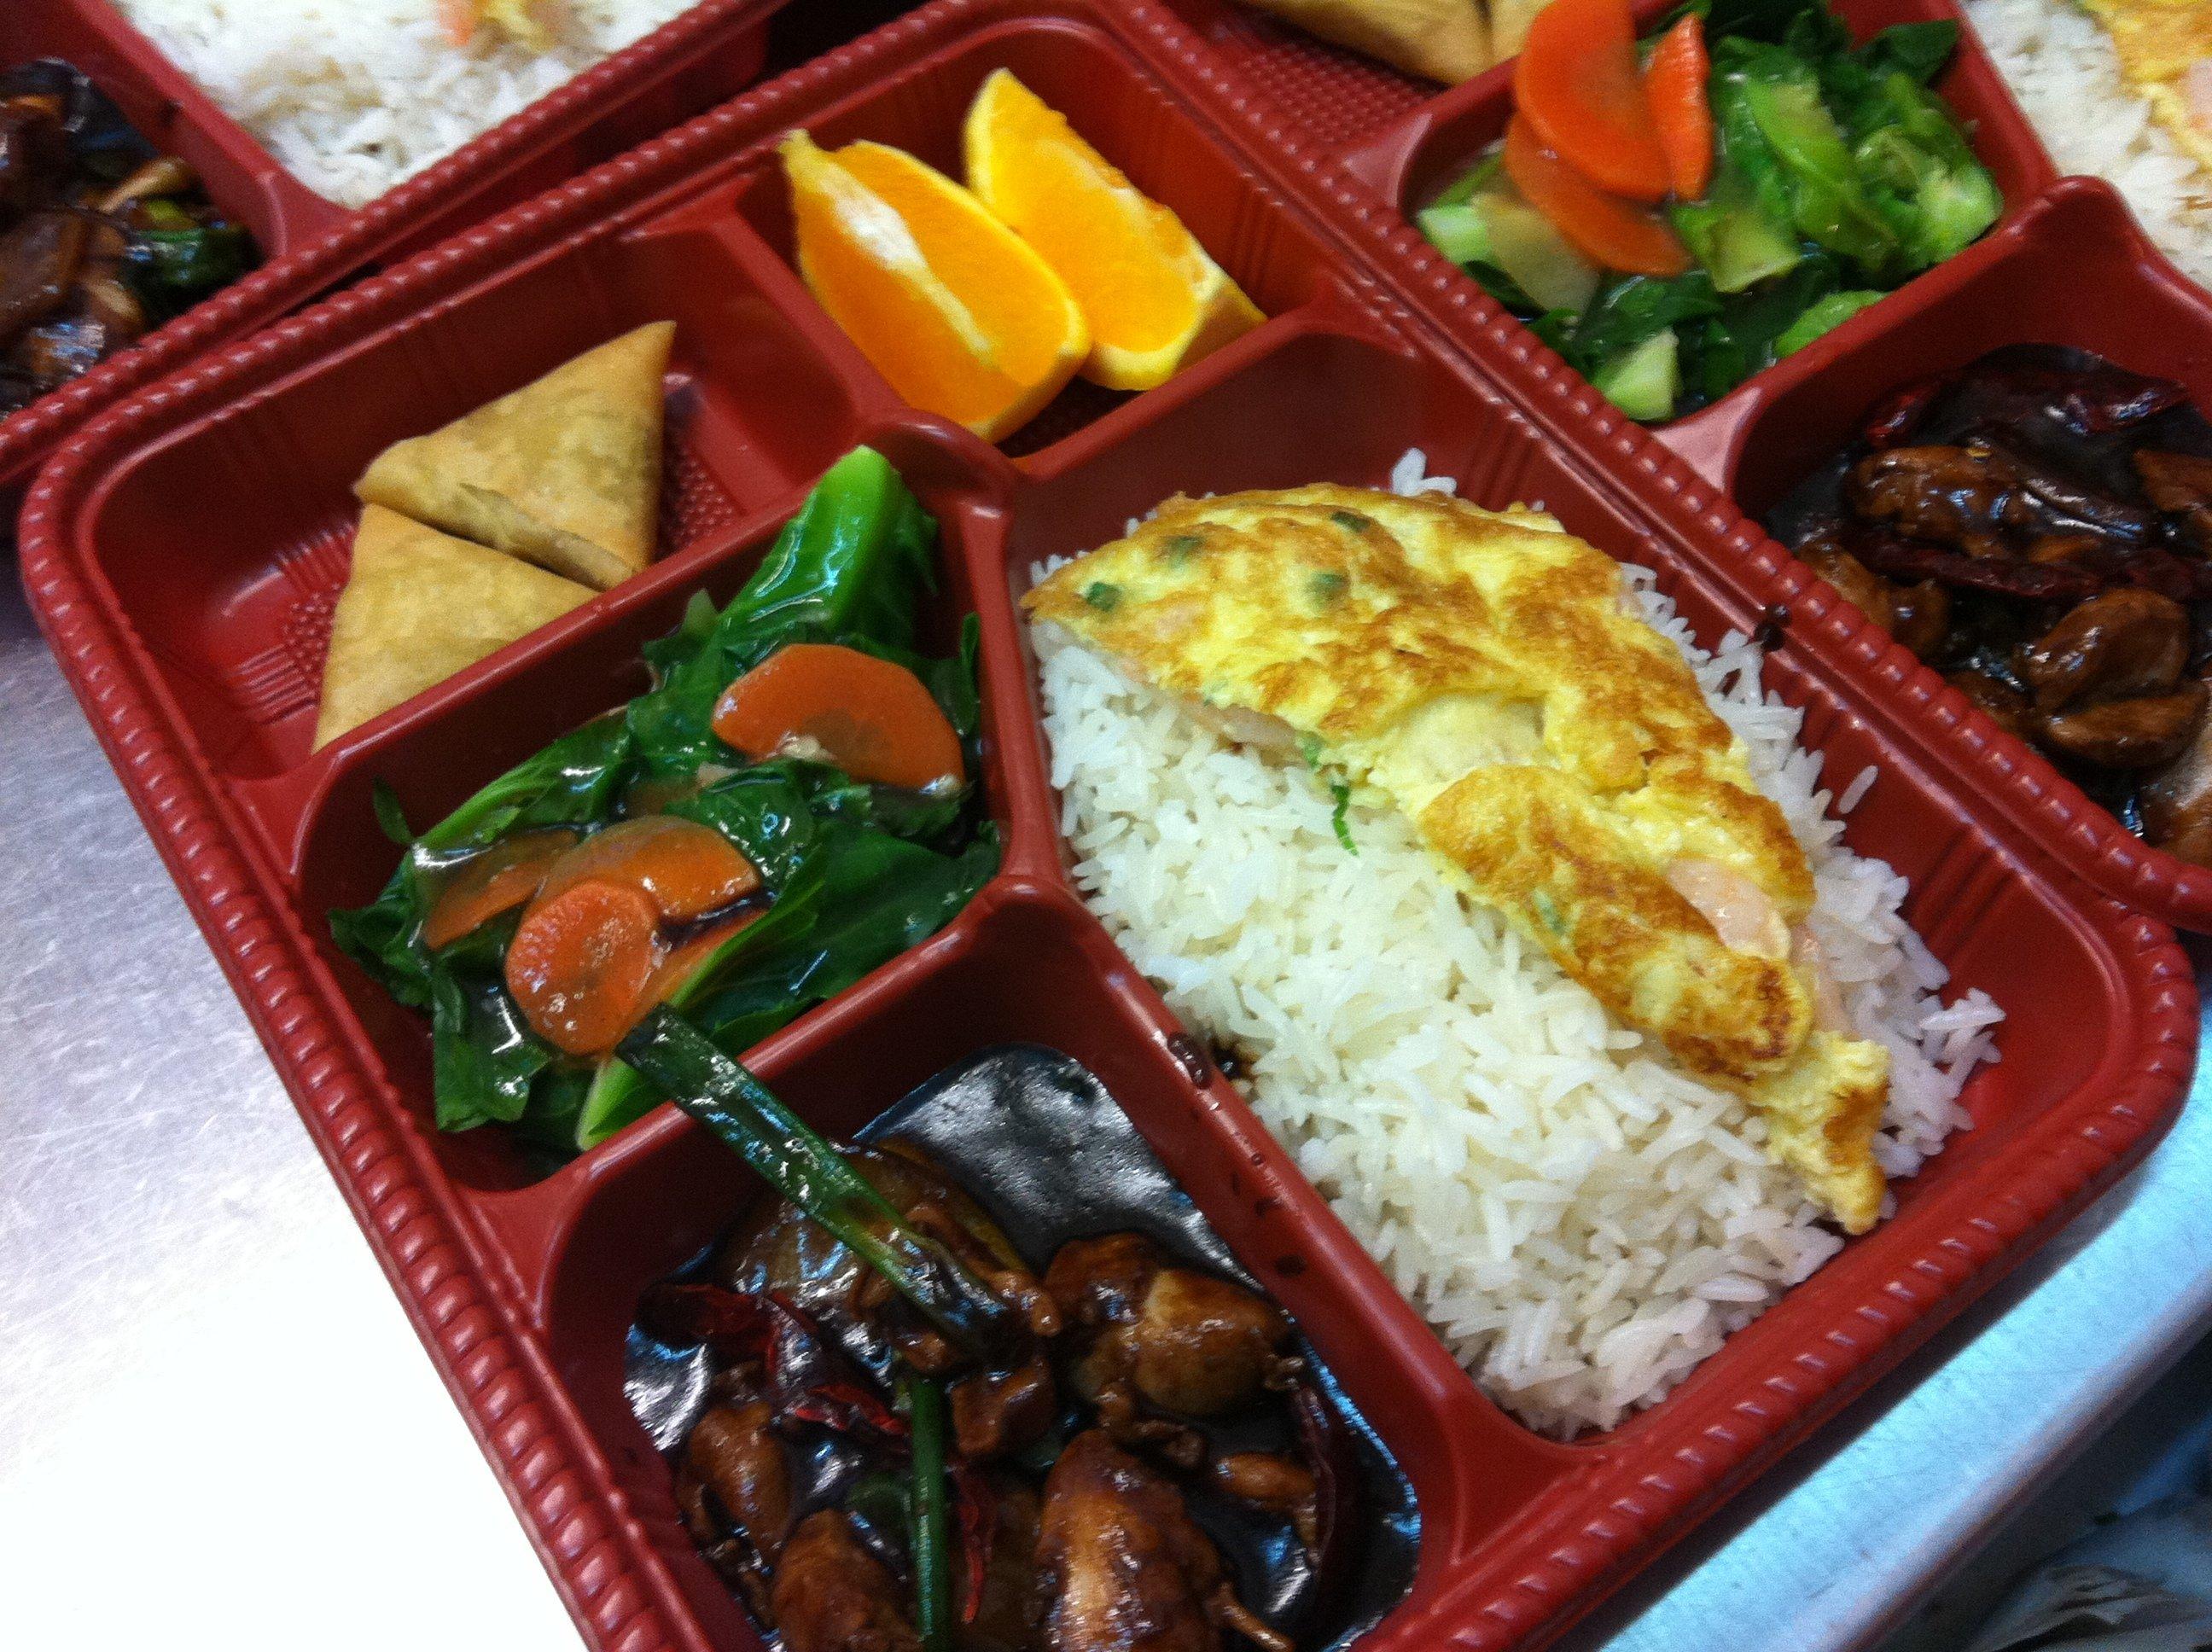 Premium Lunch Box Catering Premium Lunch Box Catering